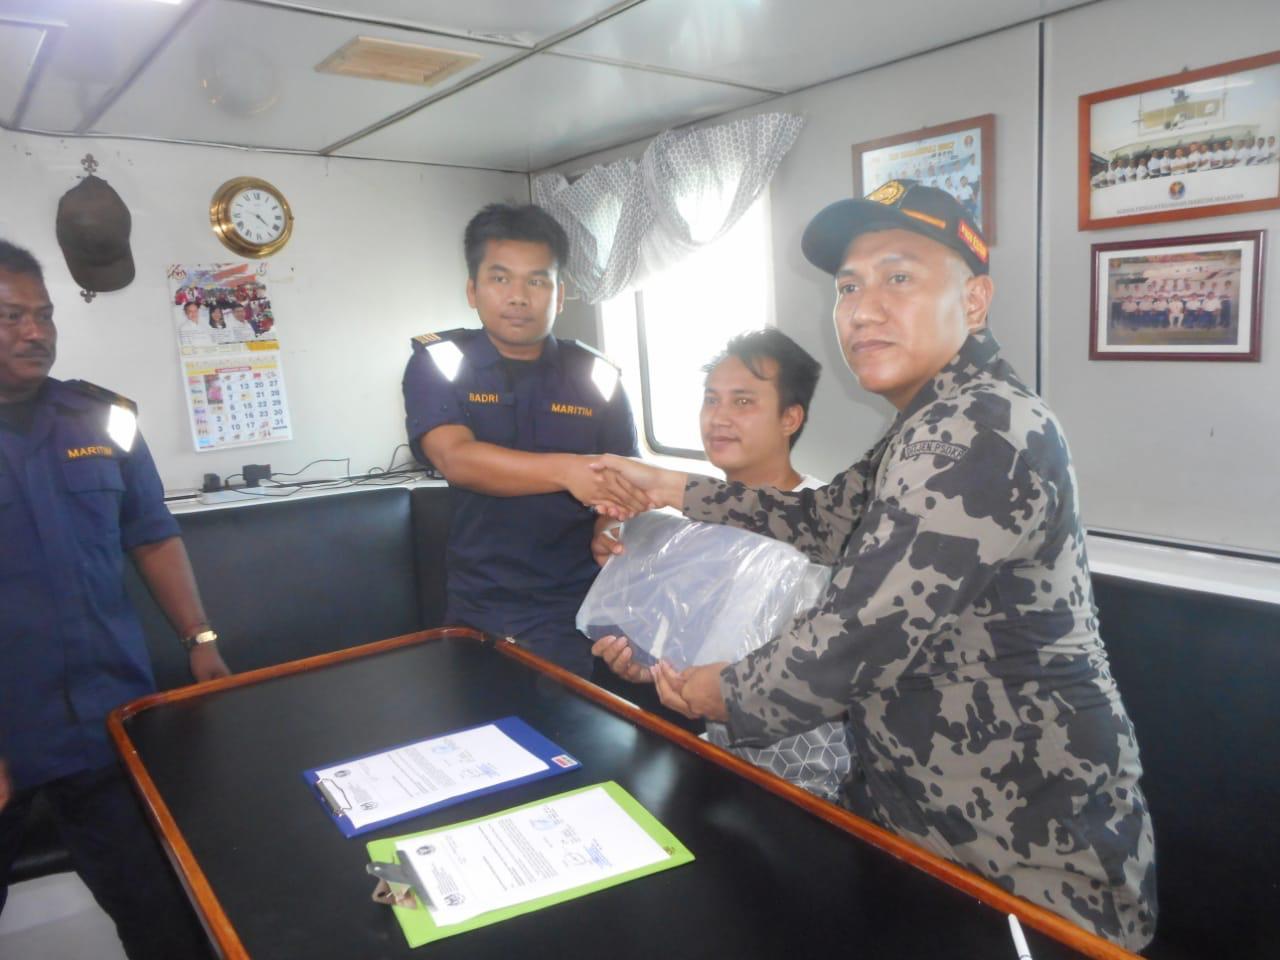 https: img.okezone.com content 2020 01 19 320 2155036 kkp-bebaskan-15-nelayan-yang-ditangkap-aparat-malaysia-VILFsKeDSI.jpg